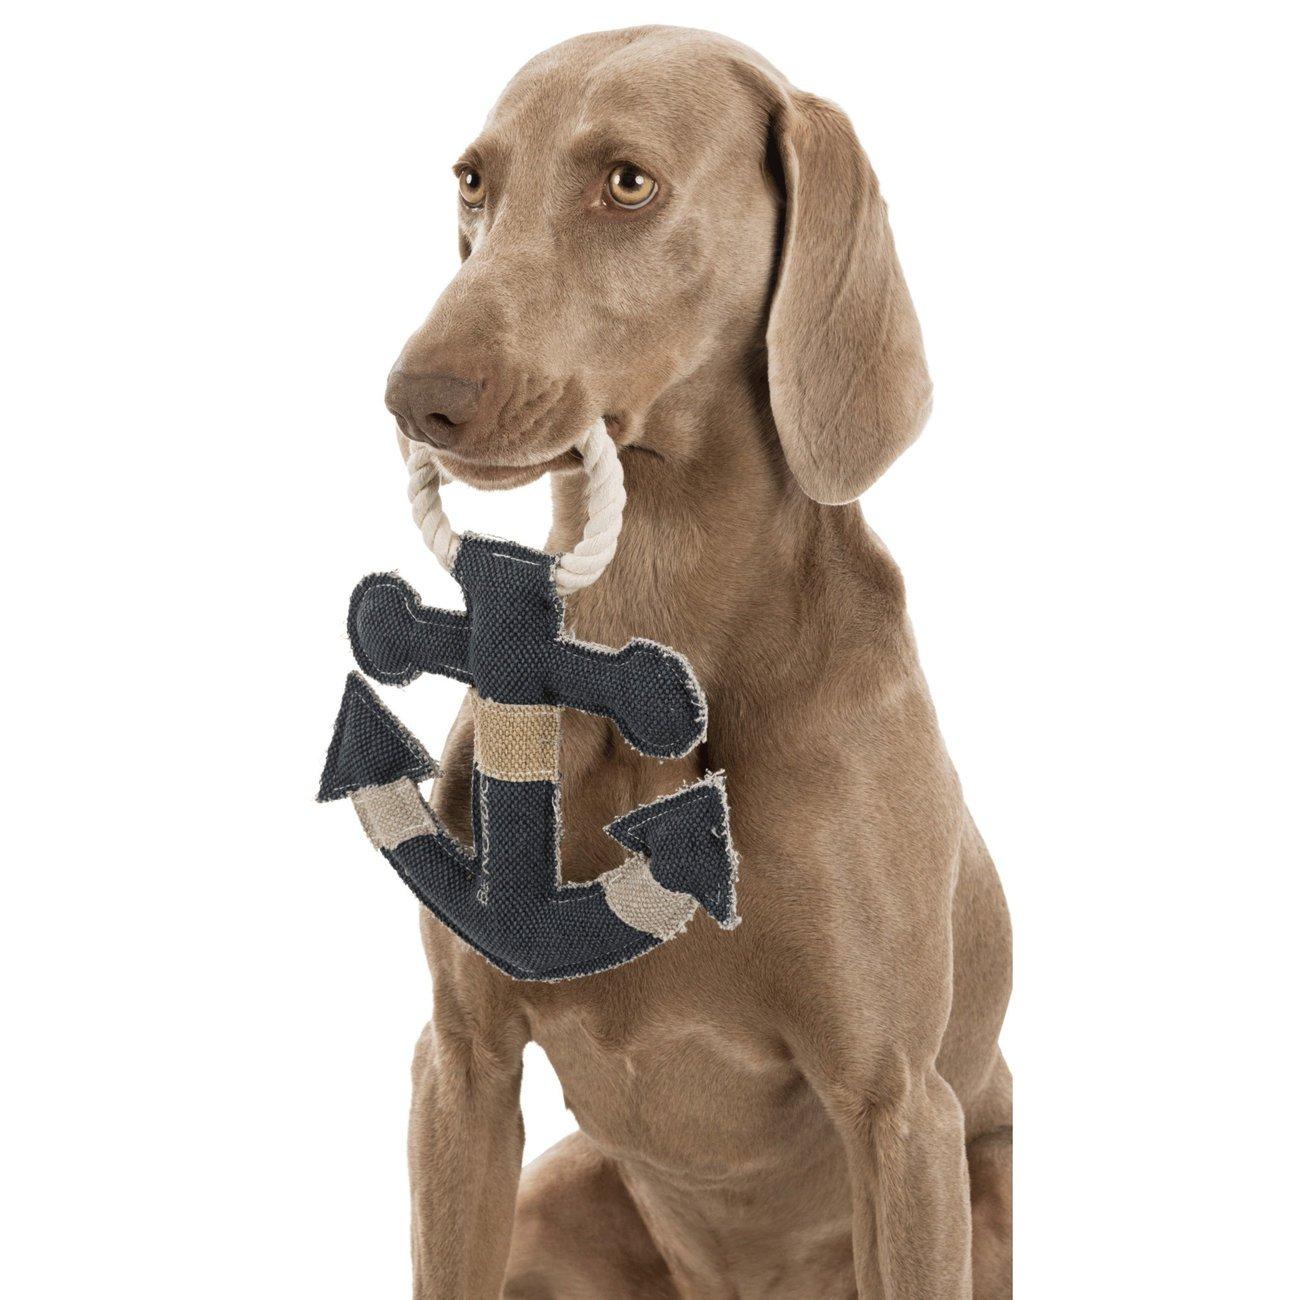 TRIXIE BE NORDIC Anker, Hundespielzeug 35651, Bild 2